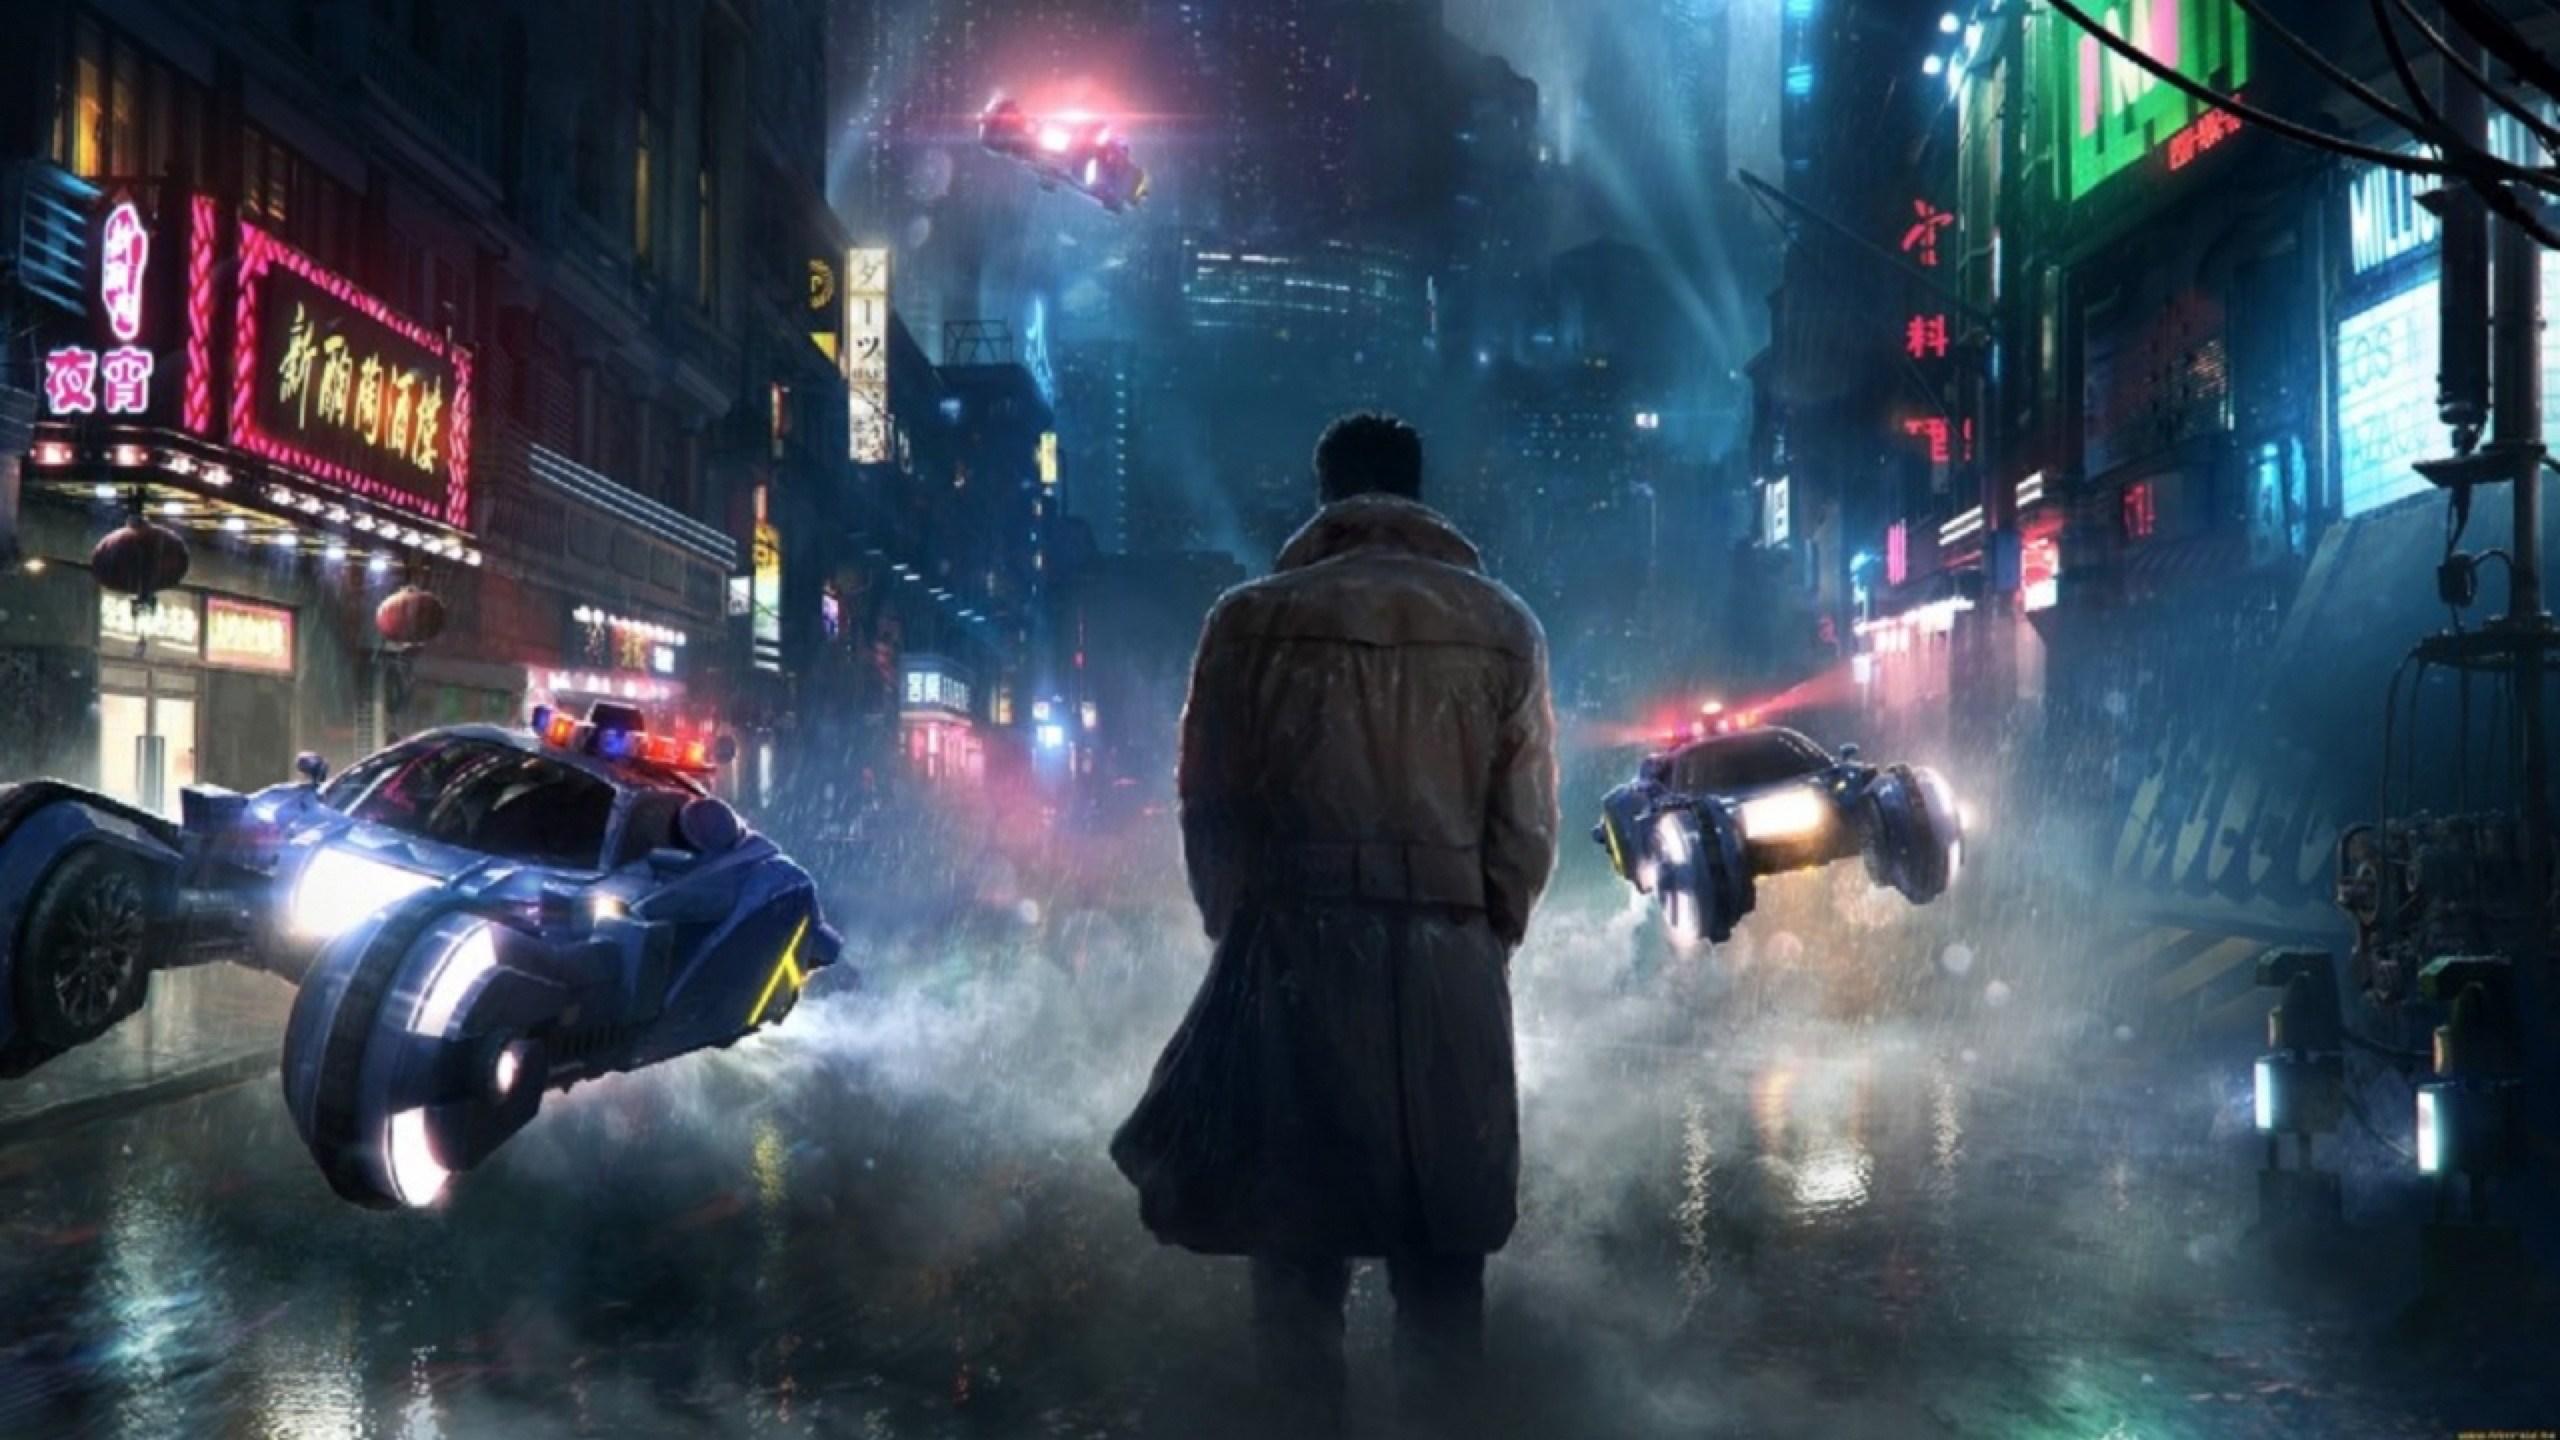 Blade Runner 2049 - Trailer 2 - CGMeetup : Community for